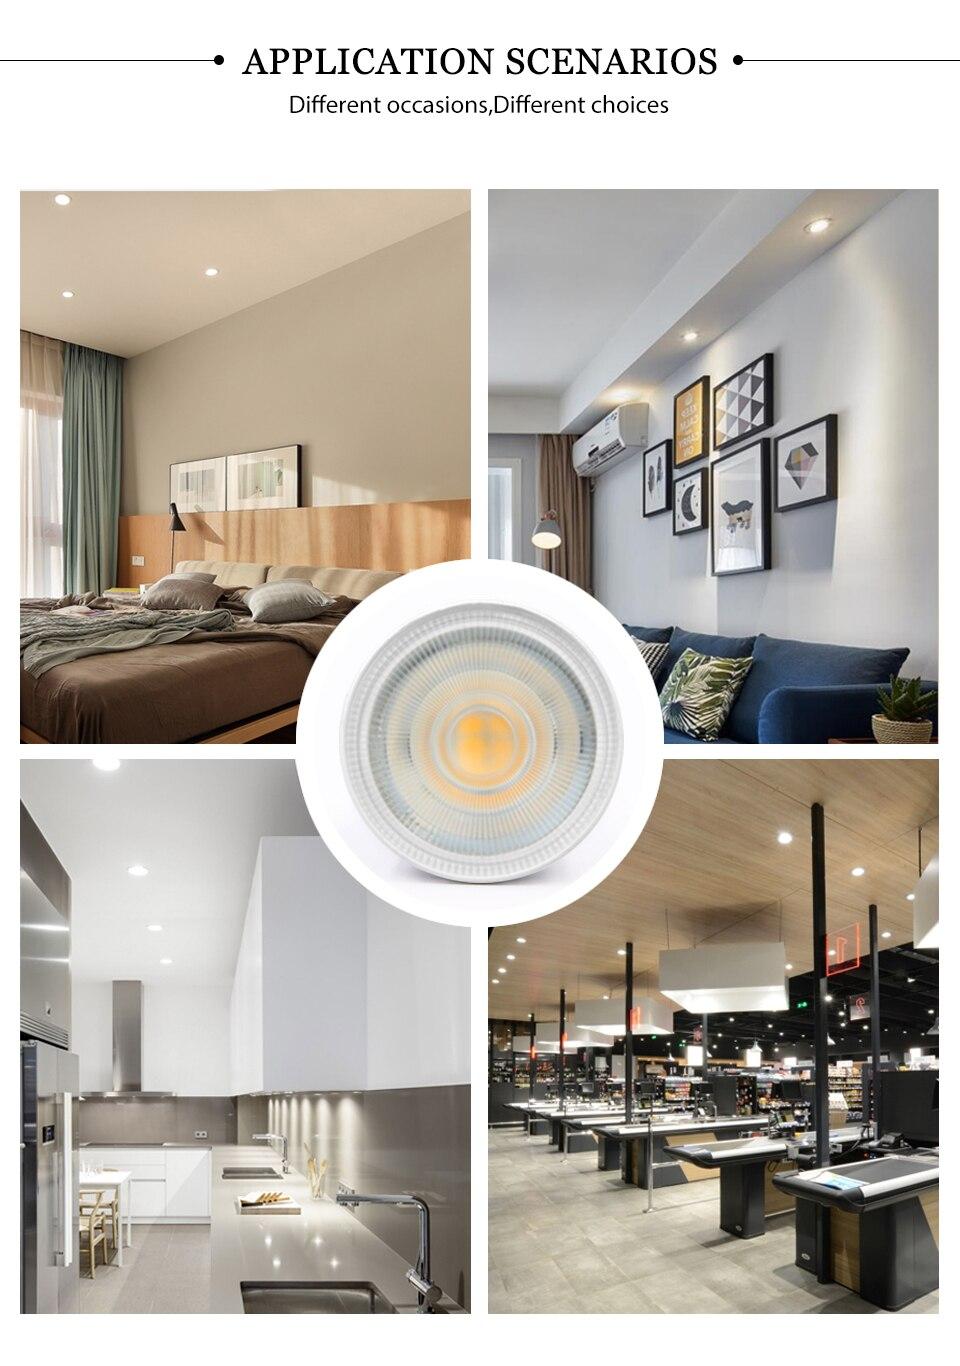 Hf5123c2be0ca4501a26321eec57444eeN - KARWEN Lampada LED Lamp 6W GU10 GU5.3 MR16 E27 E14 LED Bulb 220V Bombillas LED Spotlight Lampara Spot Light for living room